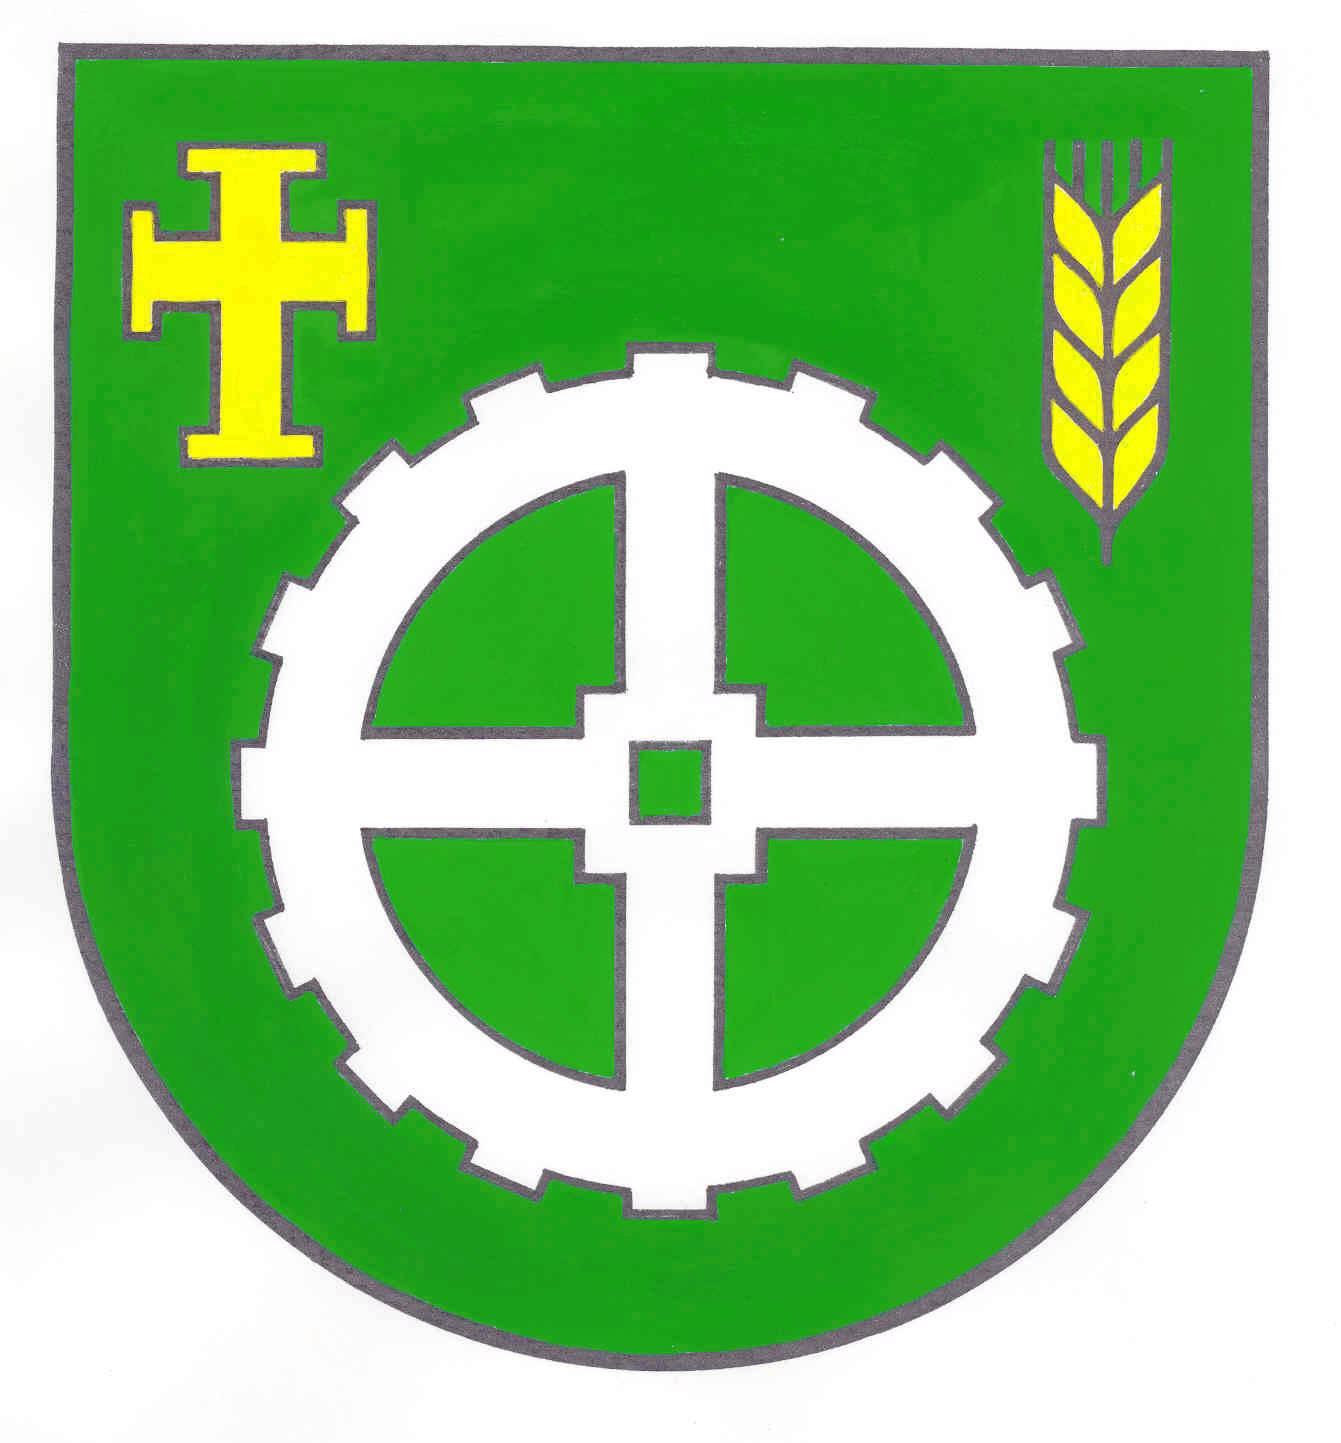 Wappen GemeindeLutterbek, Kreis Plön